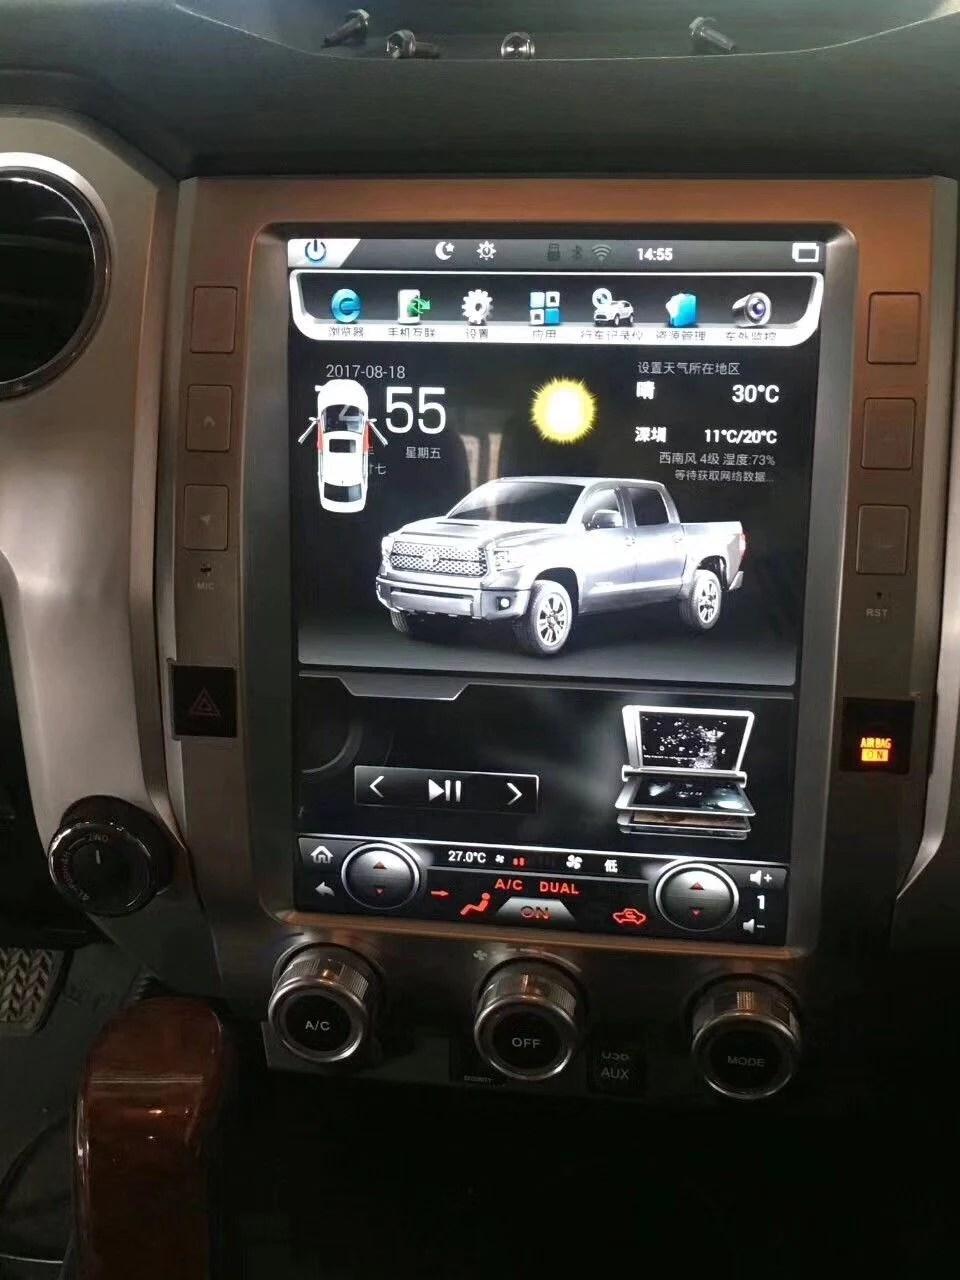 hight resolution of rhino radios toyota tundra 2014 2017 12 1 vertical screen android radio